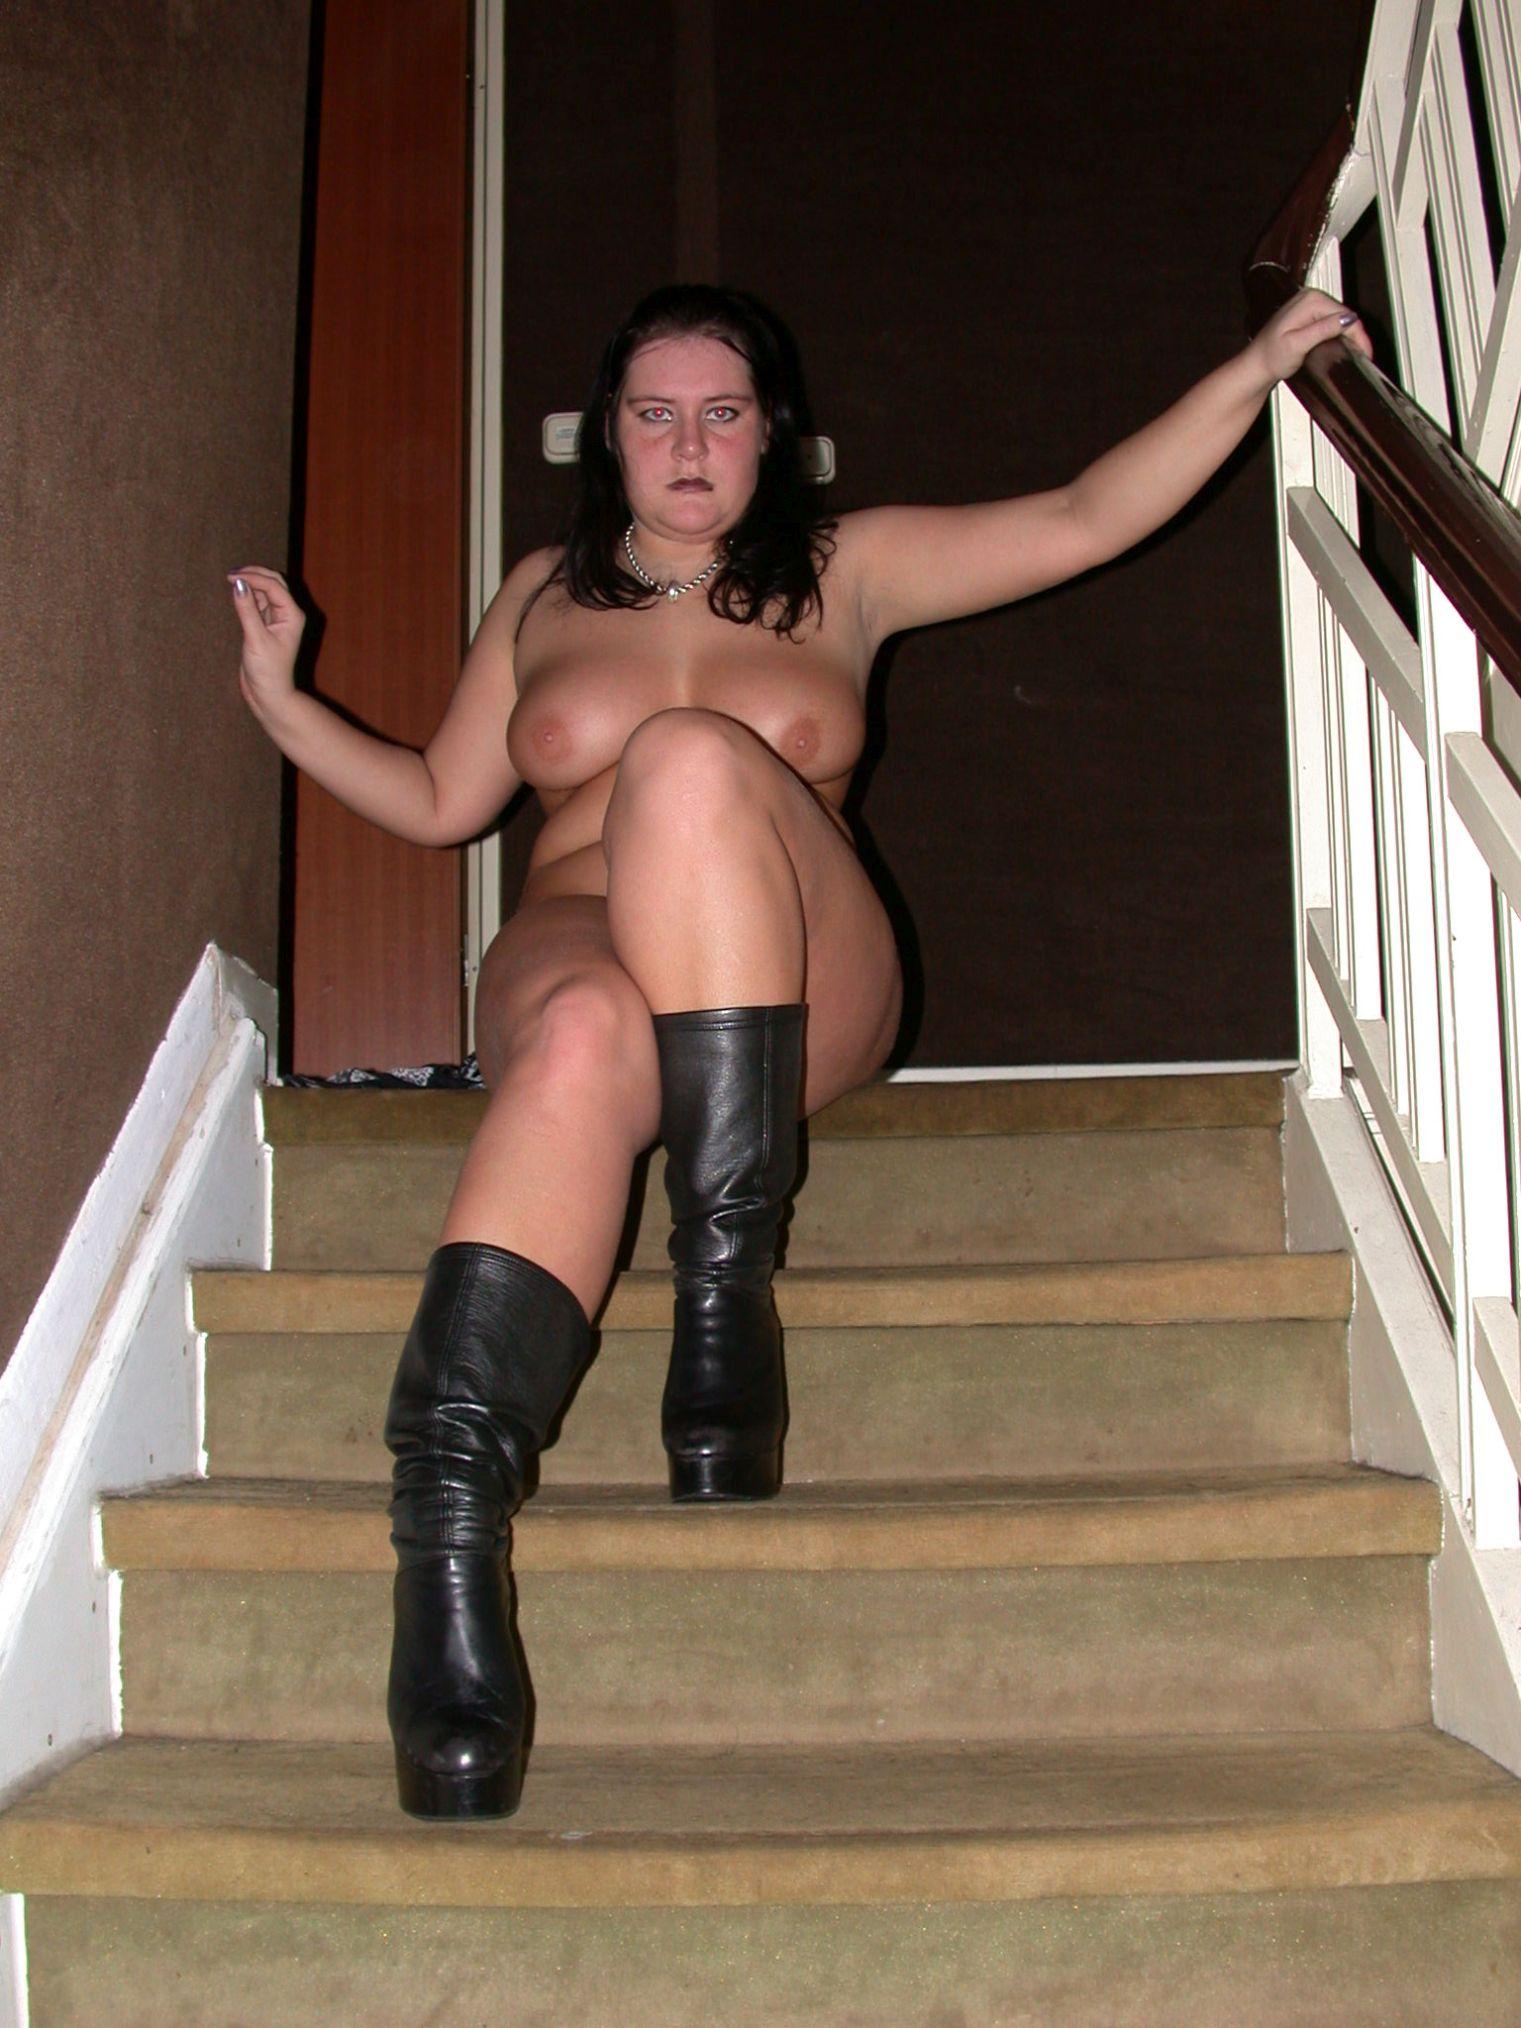 nackte dicke Frau mit Stiefeln